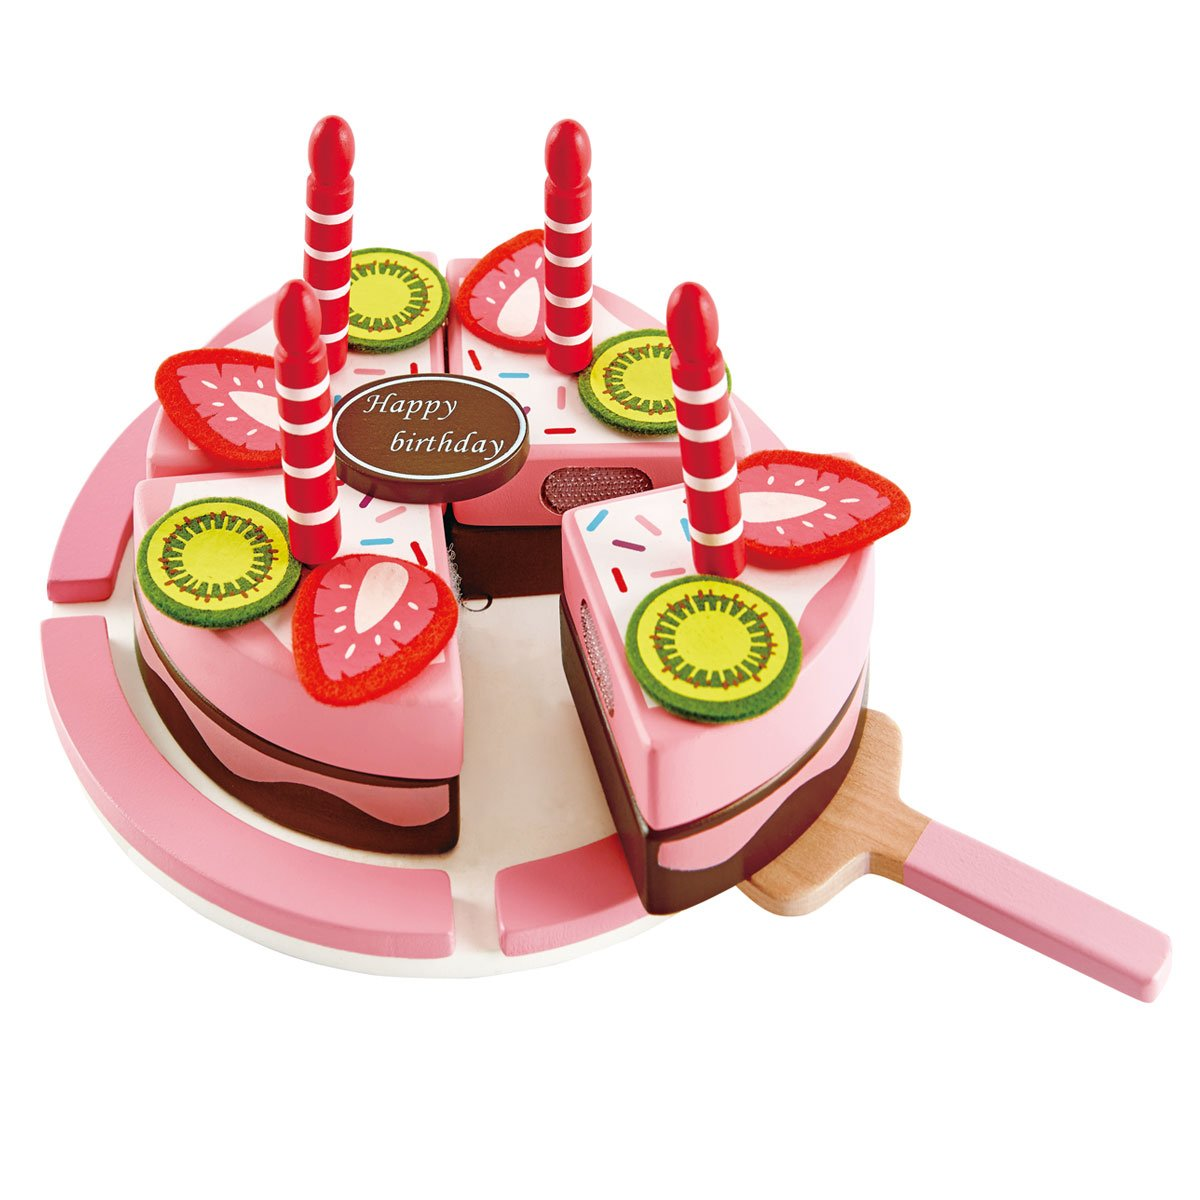 Hape - Double Flavored Birthday cake (5882)